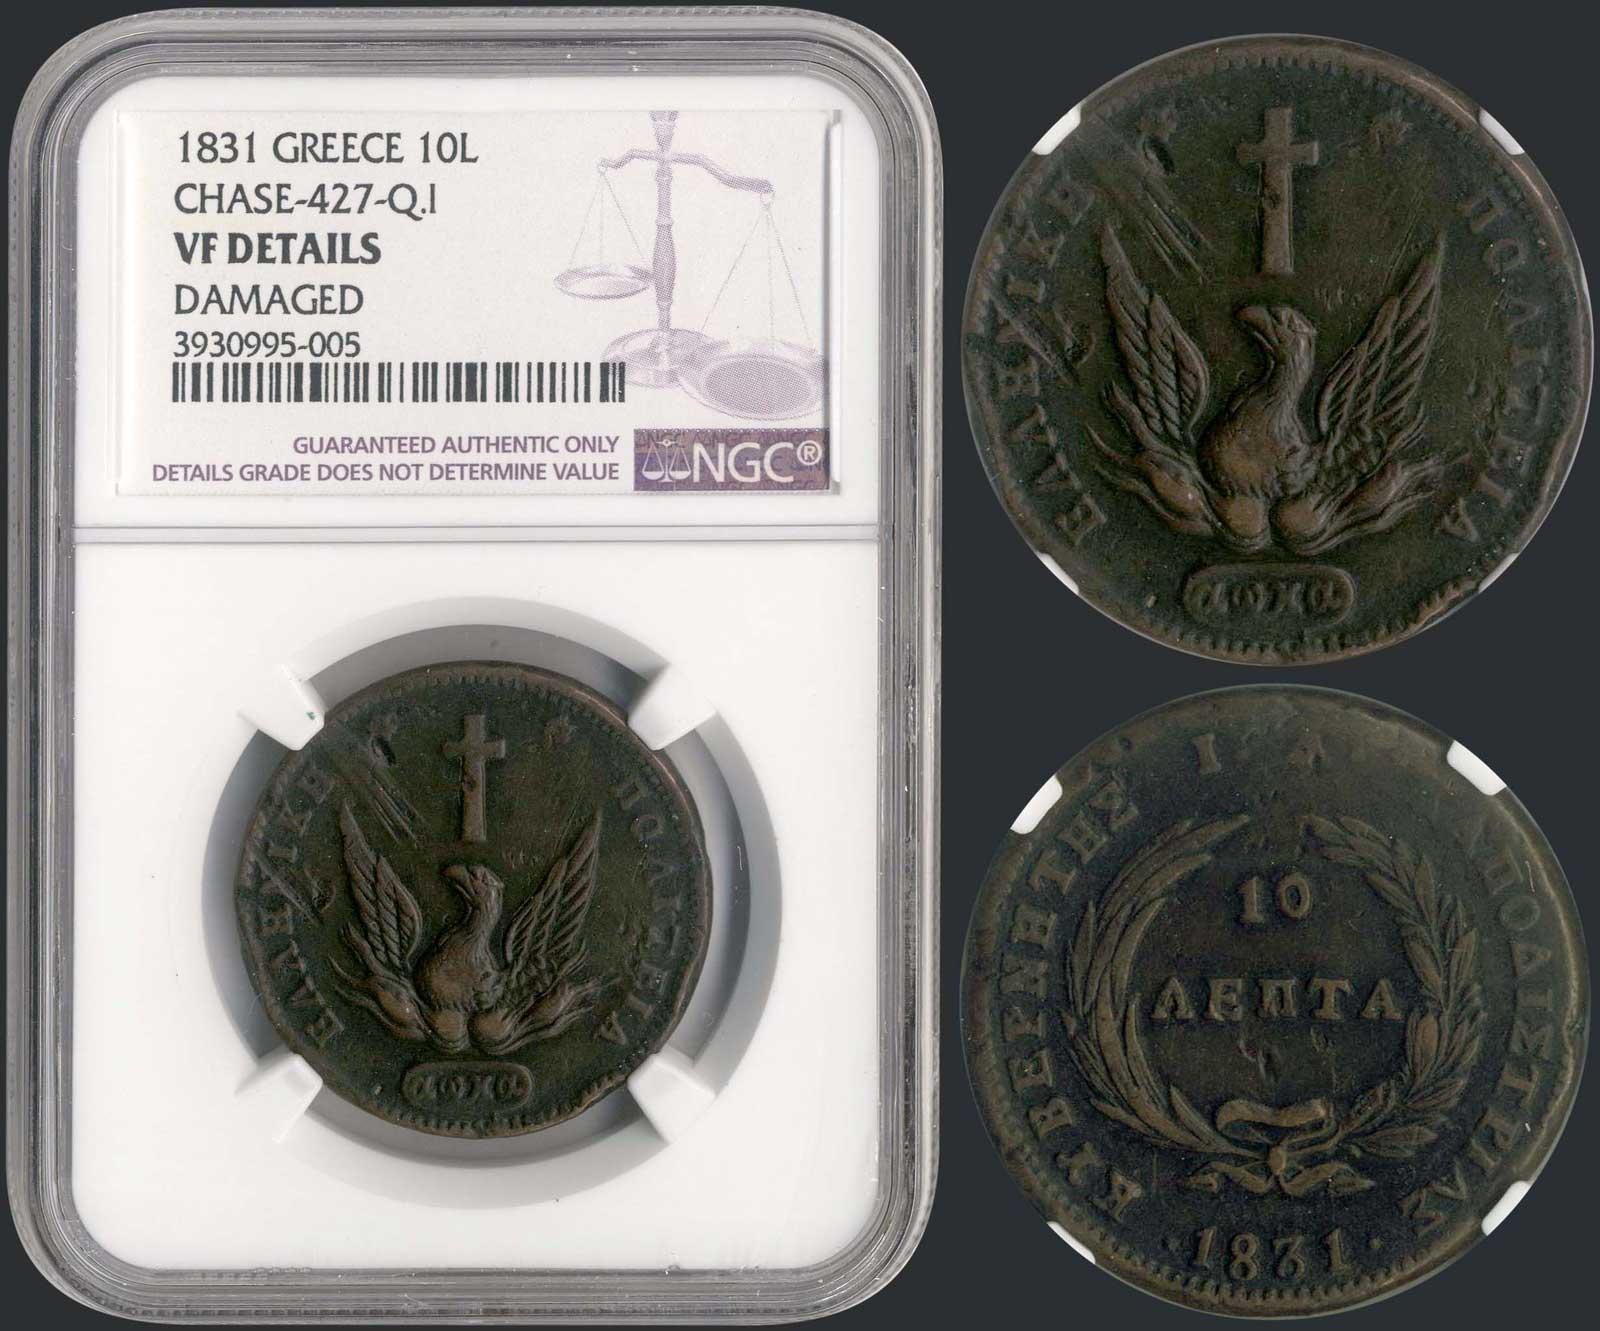 Lot 9044 - GREECE-  COINS & TOKENS governor capodistrias -  A. Karamitsos Public & LIVE Bid Auction 606 Coins, Medals & Banknotes